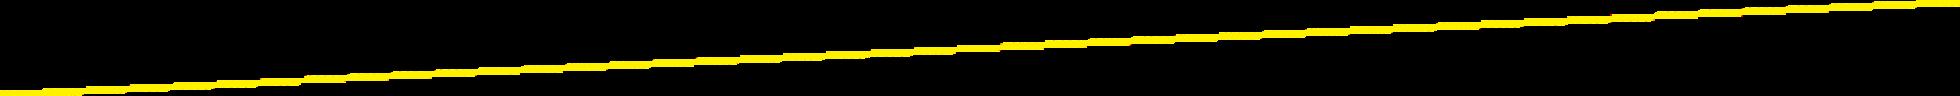 Angled_Line-Yellow up.png